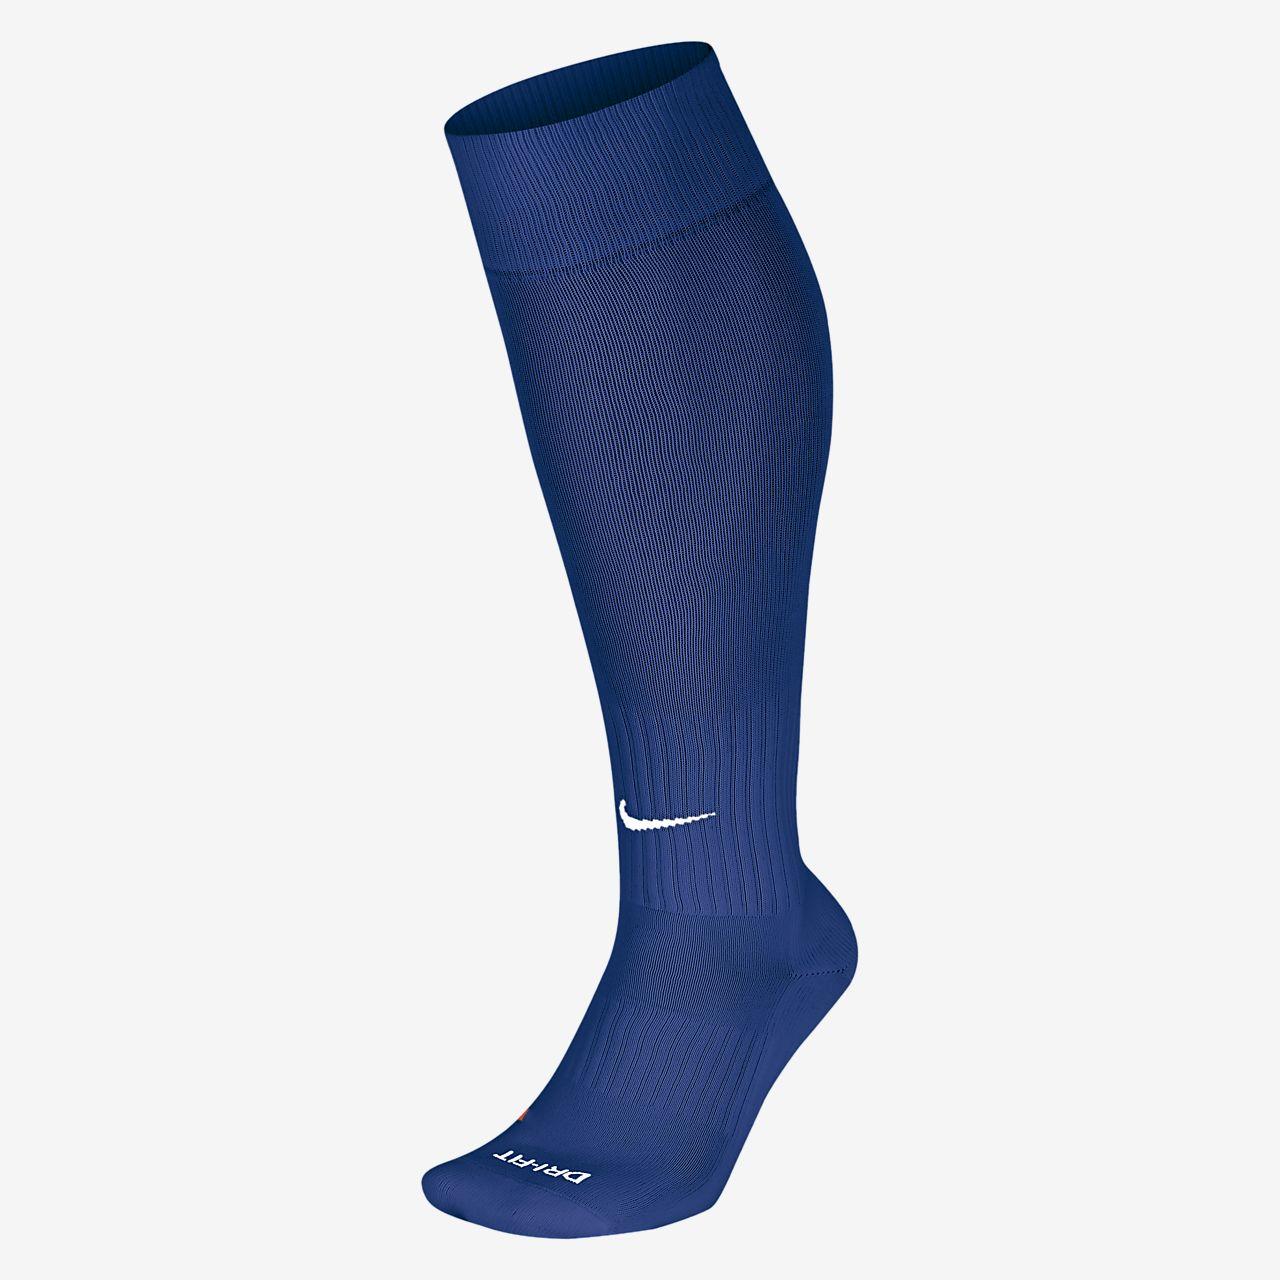 Nike Classic fotballstrømpe